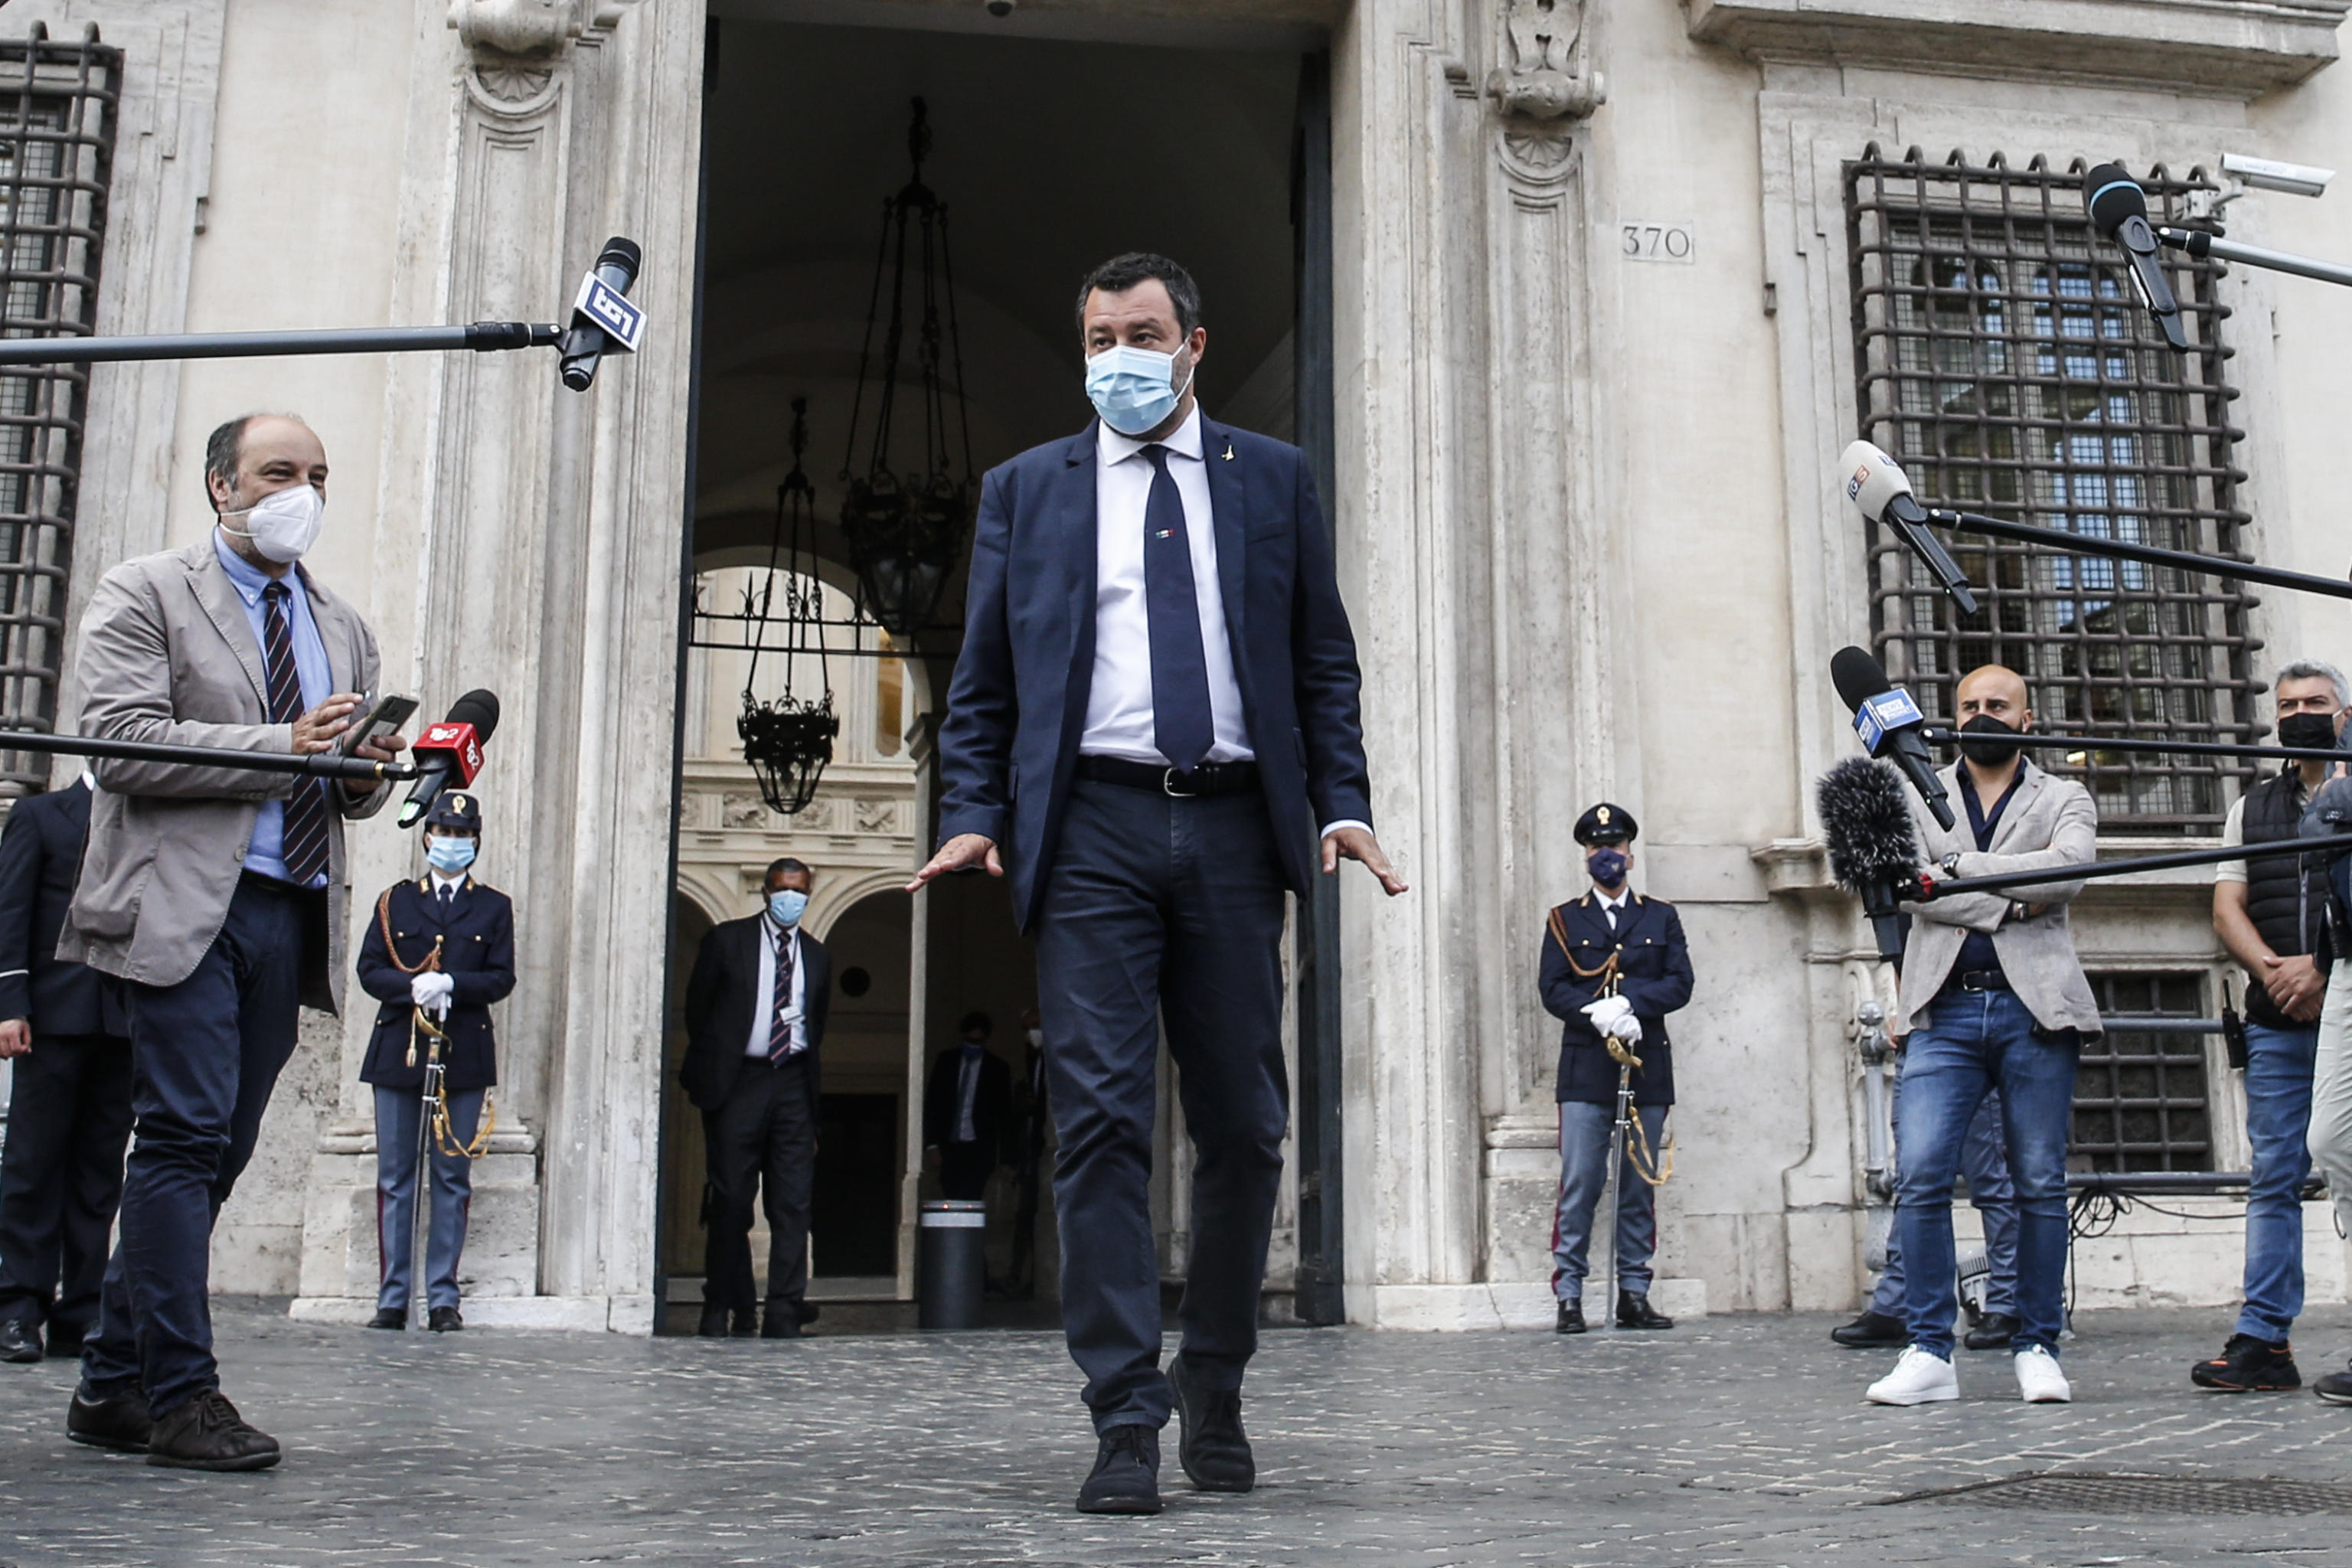 Salvini vede Draghi: «Misure? Si valuta la settimana prossima. Rammarico per frasi ingenerose»